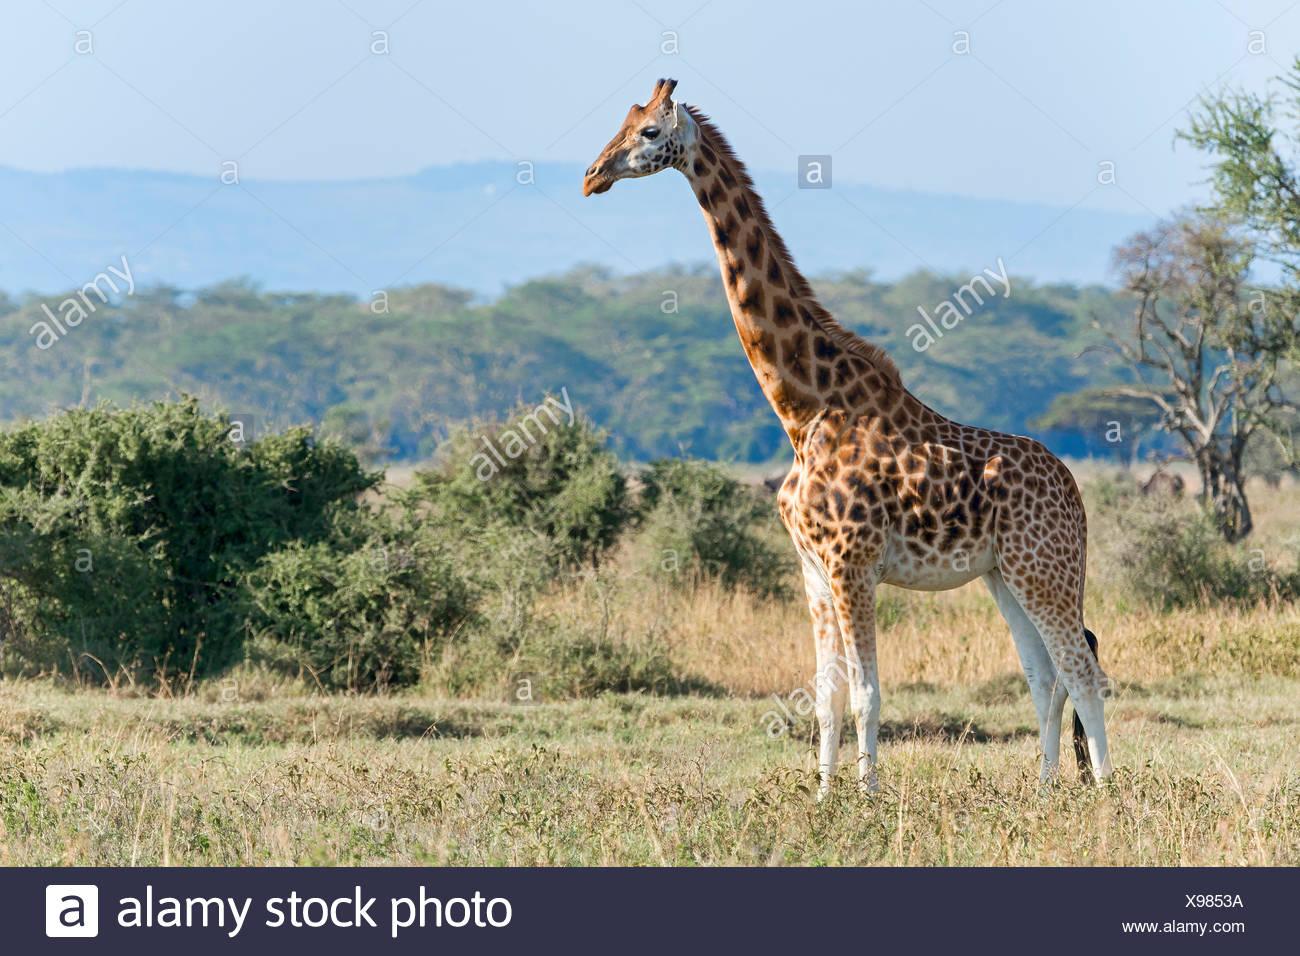 Rothschild's giraffe (Giraffa camelopardalis rothschildi), Lake Nakuru National Park, Kenya - Stock Image